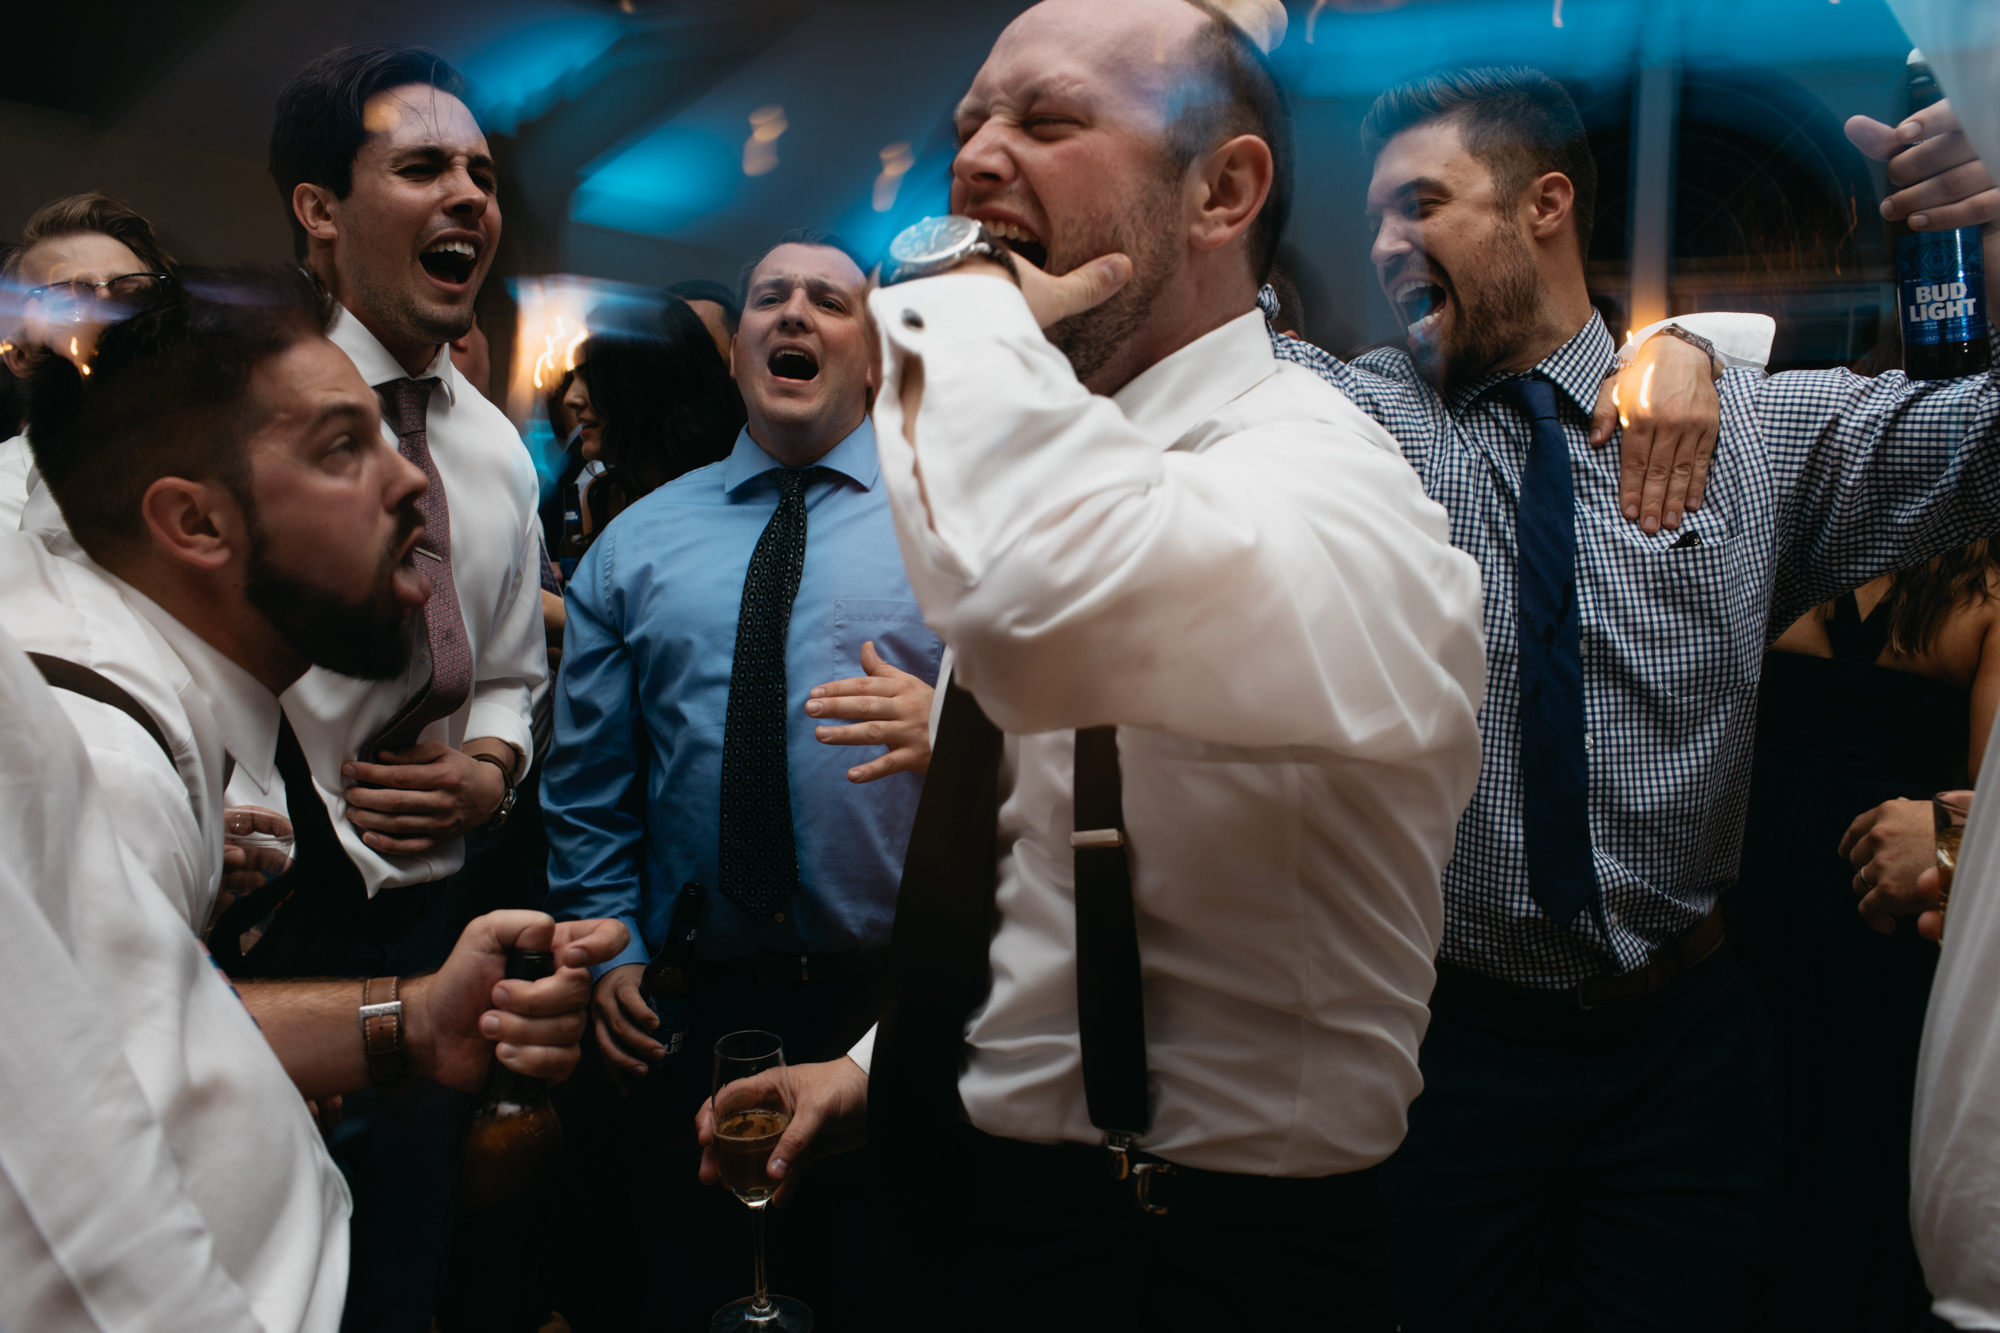 Jaclyn_Andrew_quincy_massachusetts_wedding039.jpg